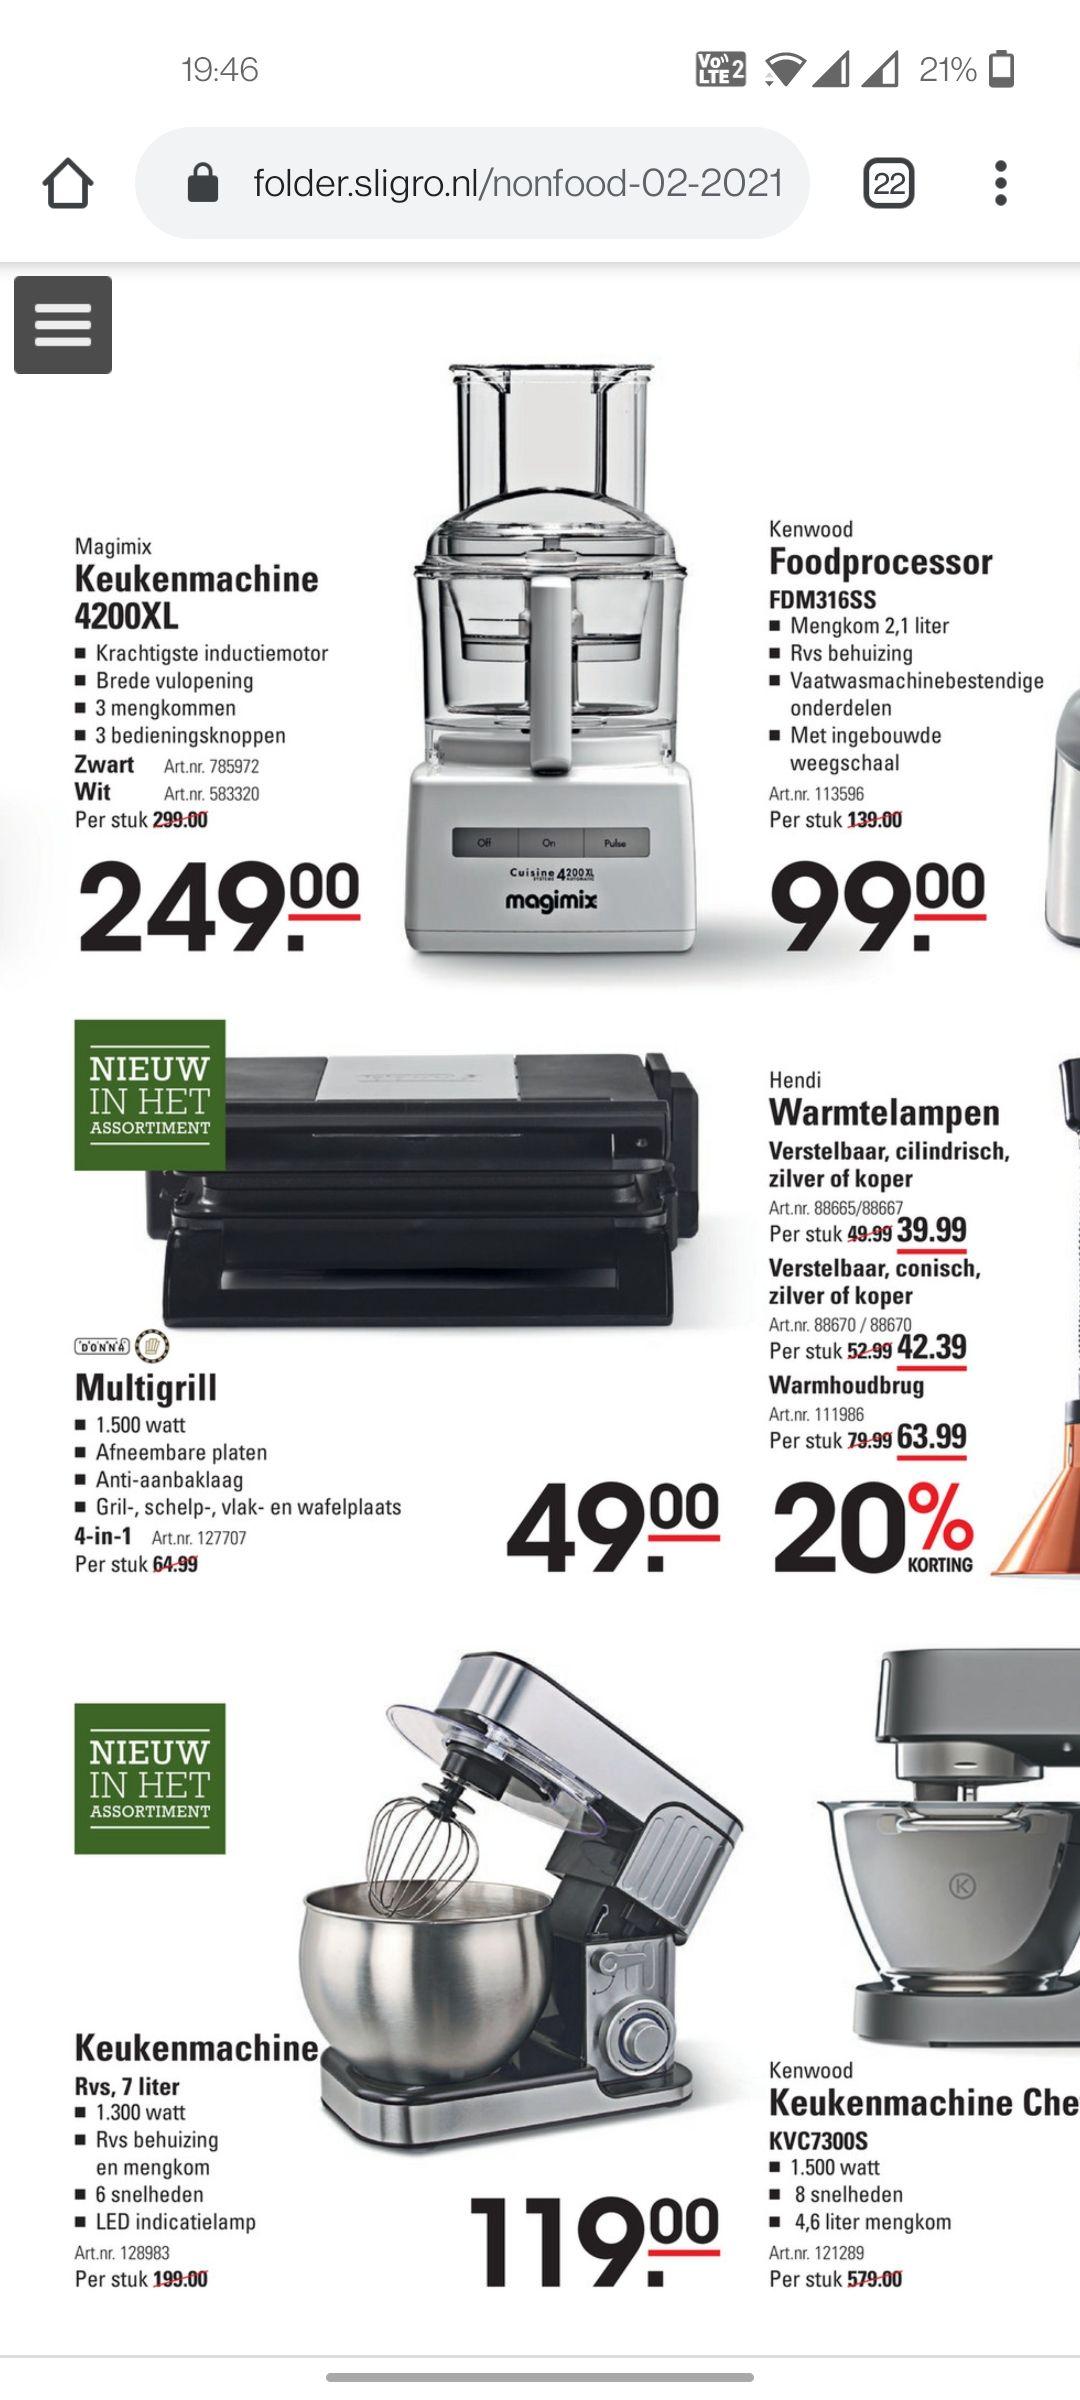 Magimix keukenmachine 4200XL